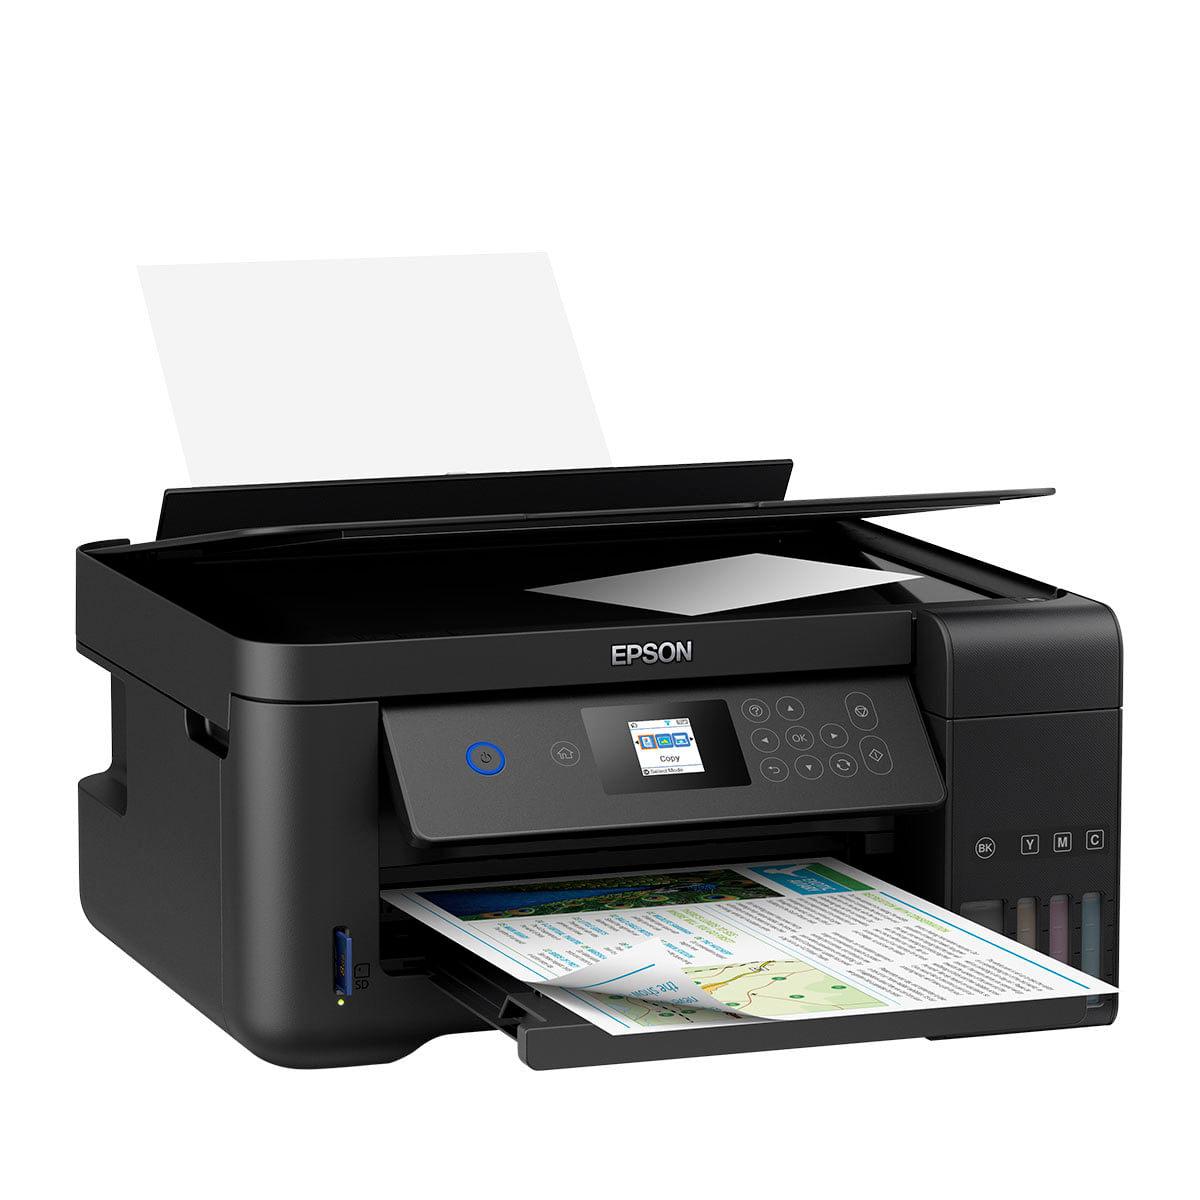 Impressora Multifuncional Epson EcoTank L4160 com tinta sublimática  - ECONOMIZOU